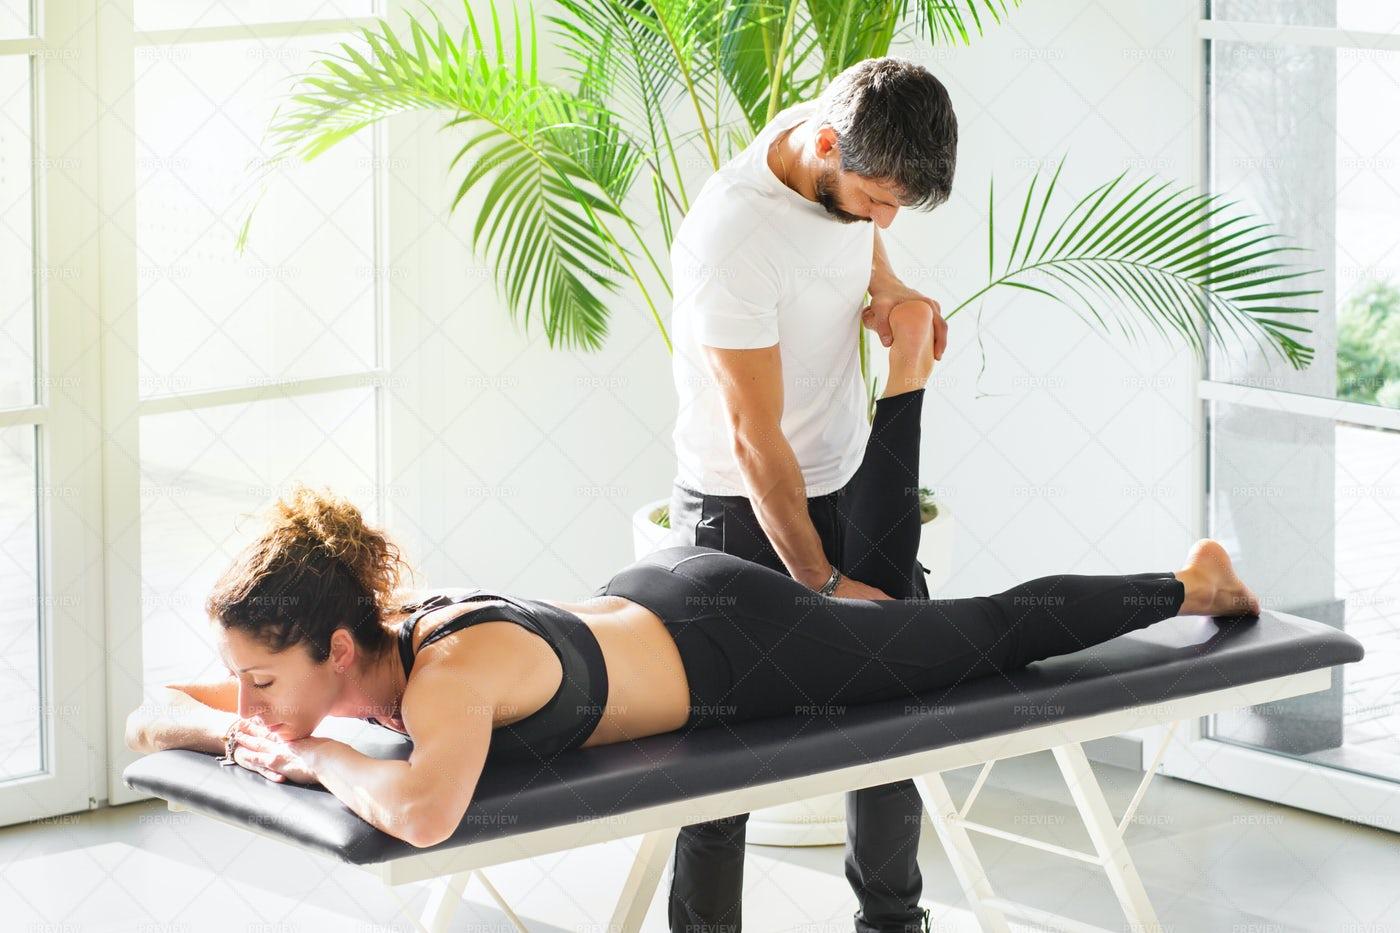 Osteopath At Work: Stock Photos